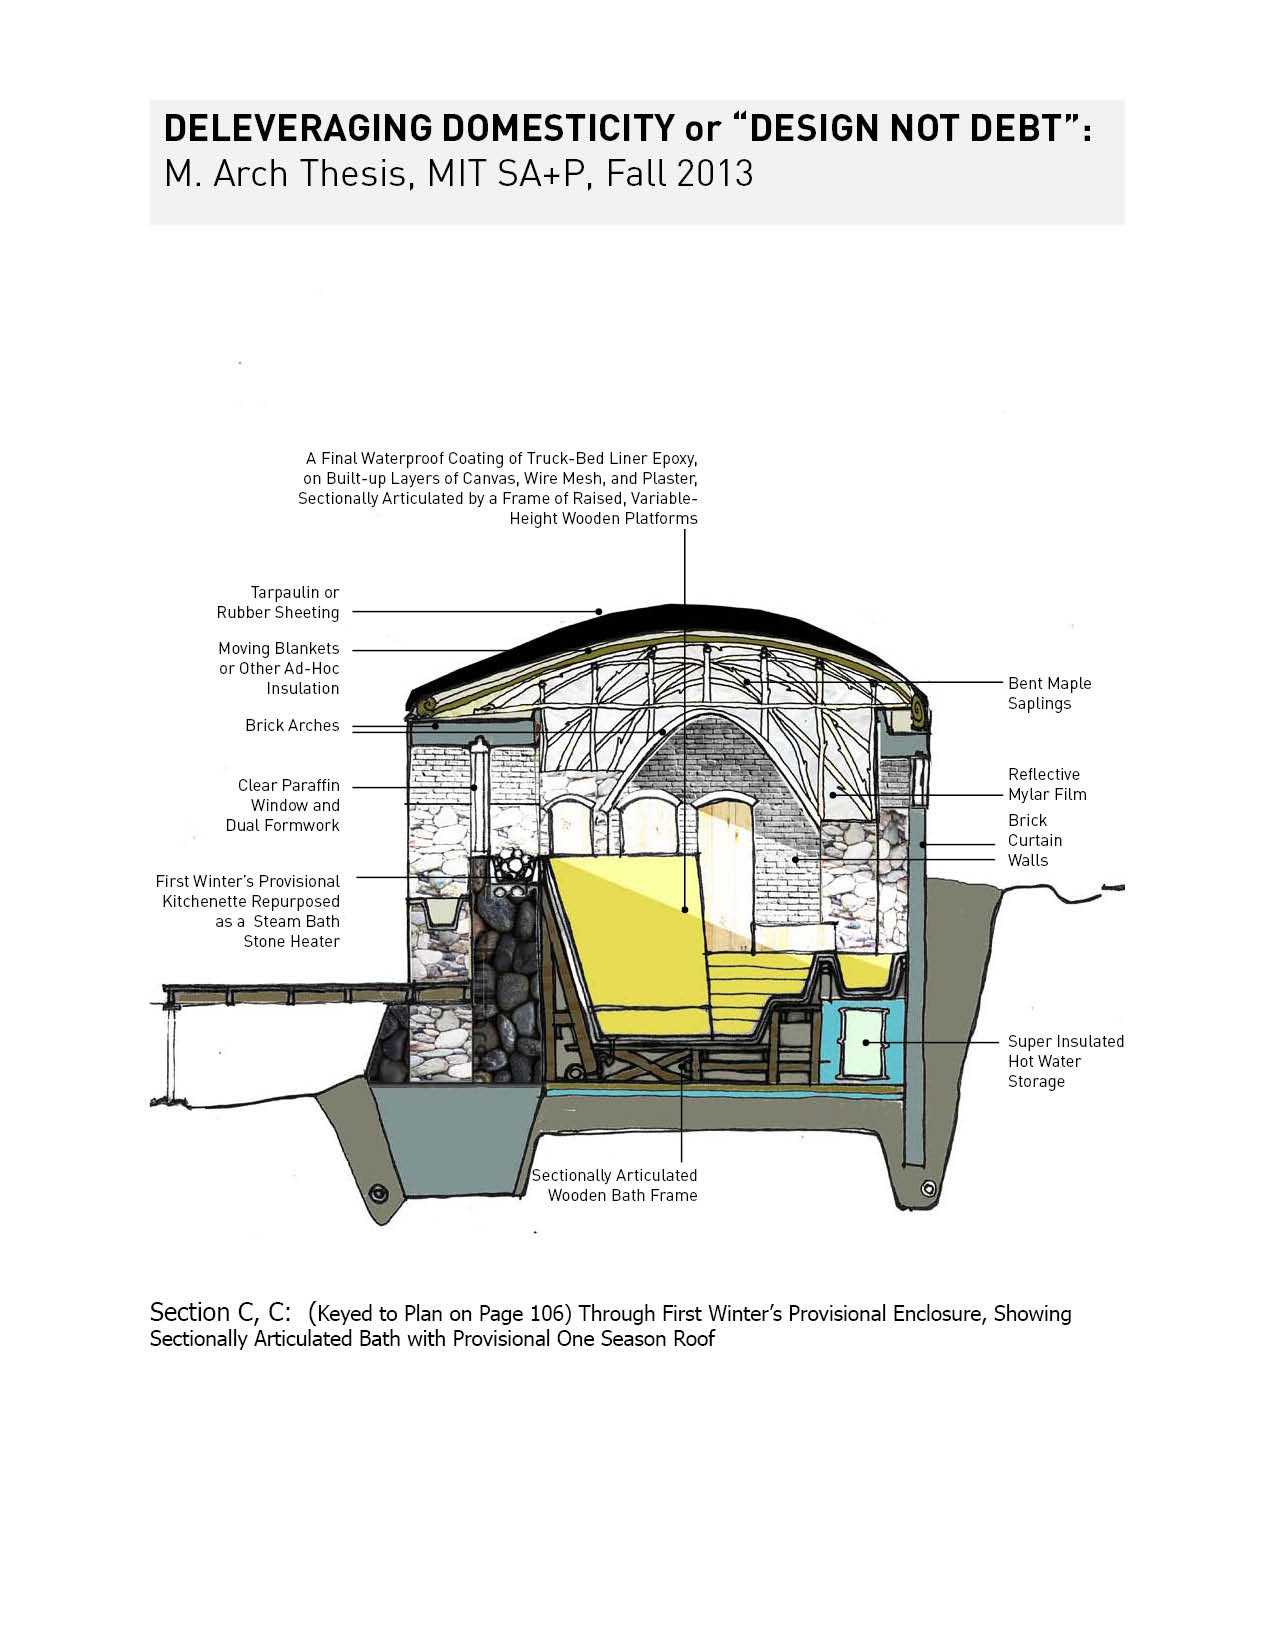 MIT_thesis43.jpg